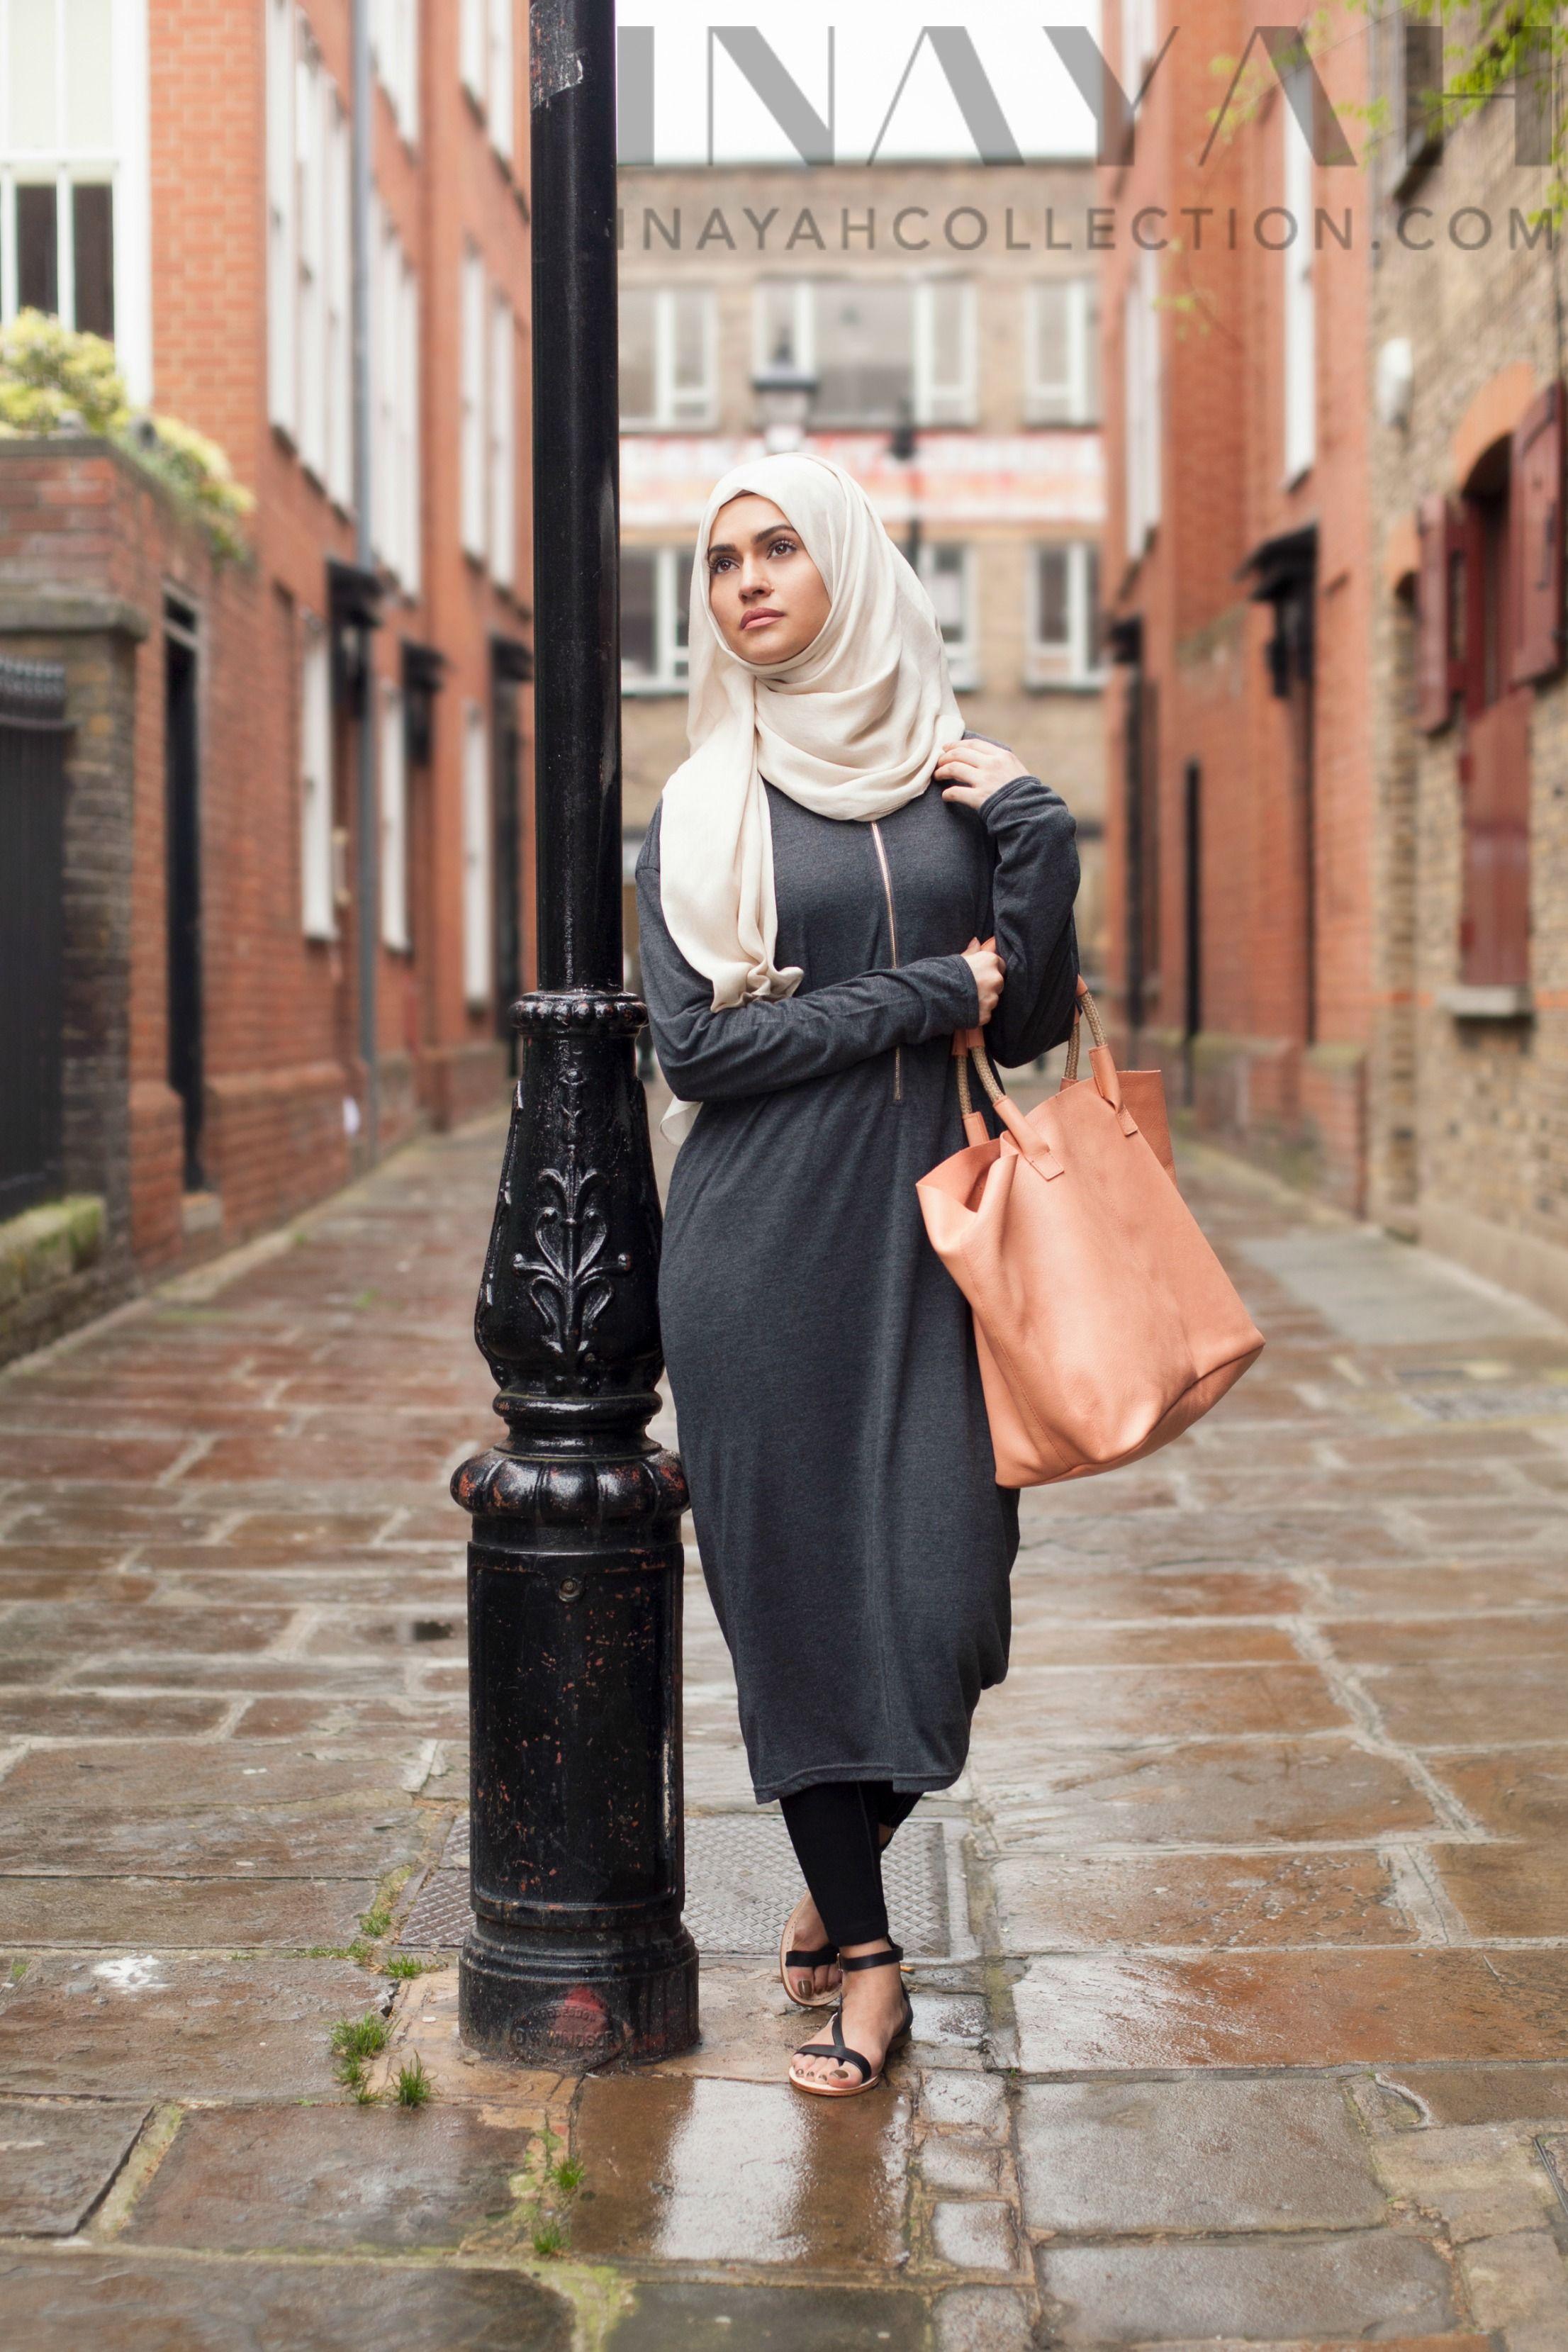 Pin By Joymuslim On Hijab Streetstyle Pinterest Fashion Busana Muslim Abaya Layla Phasmina Hajib Modest Outfits Womens Unique